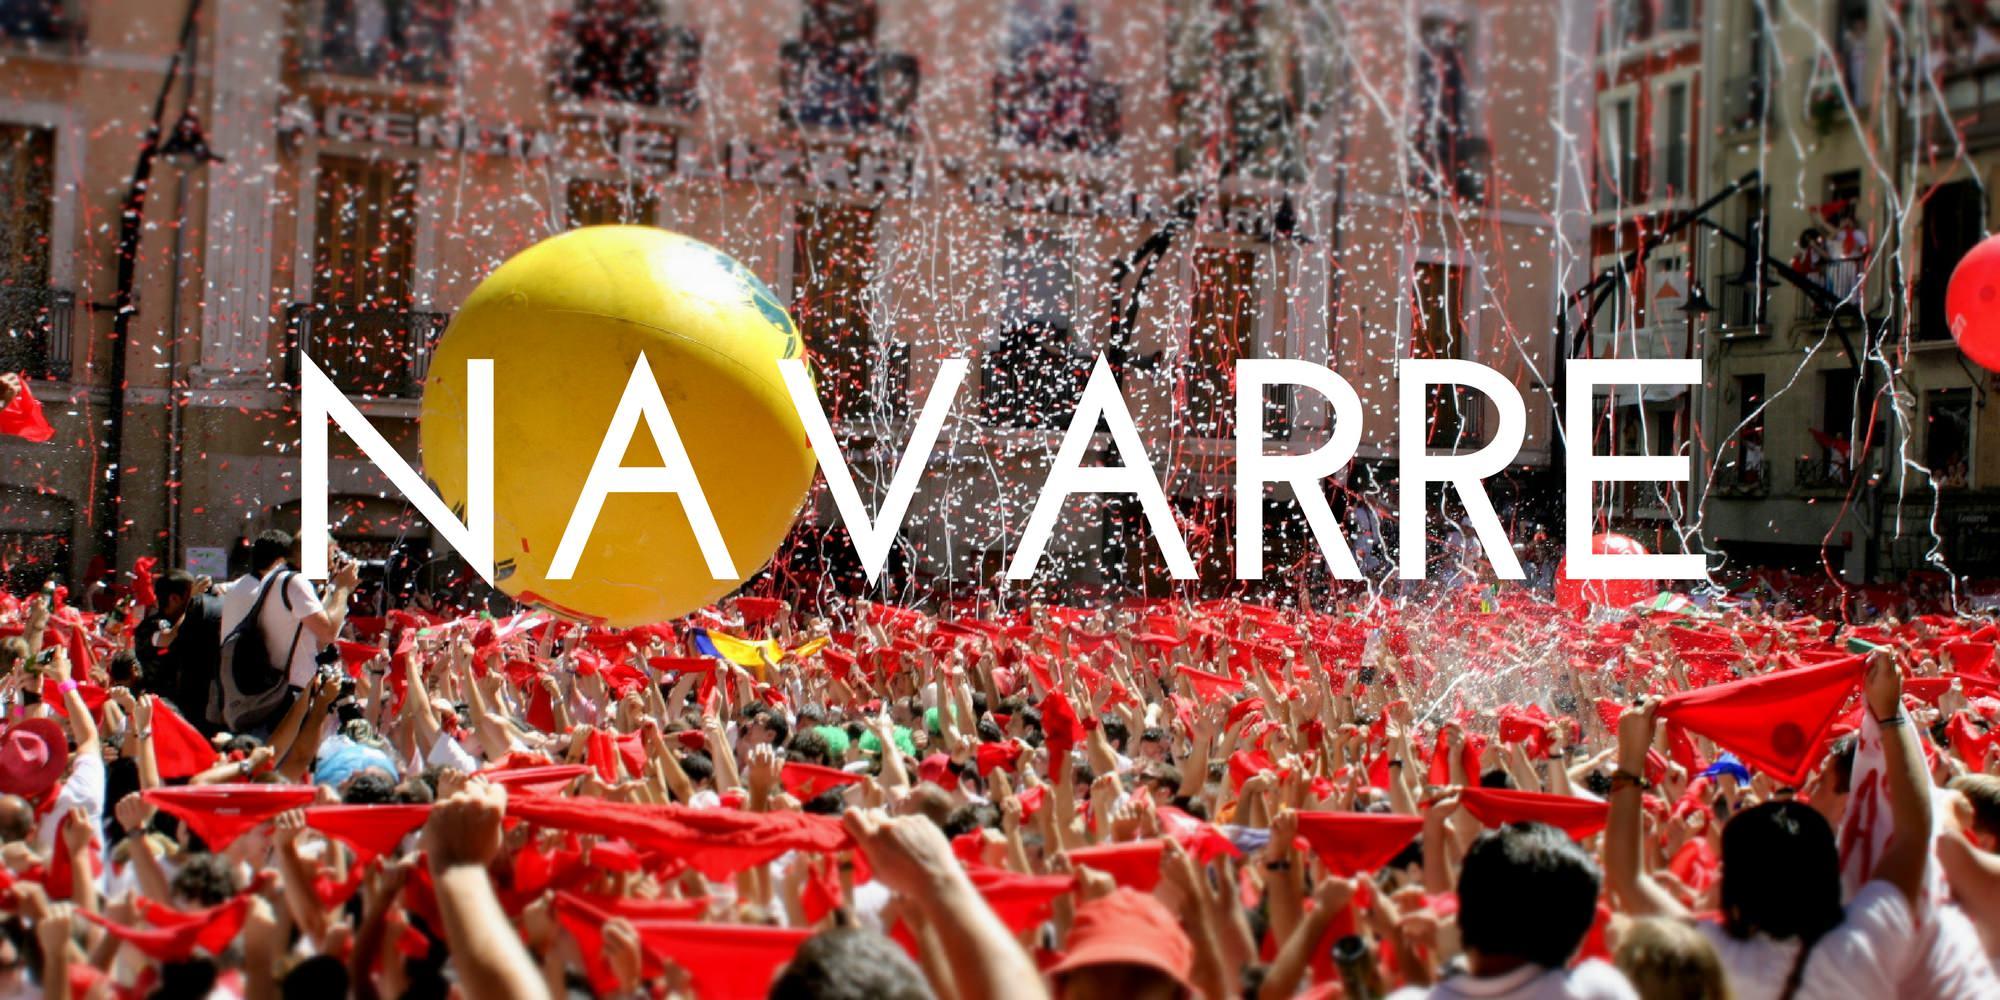 Navarre - Authentic Traveling - Header